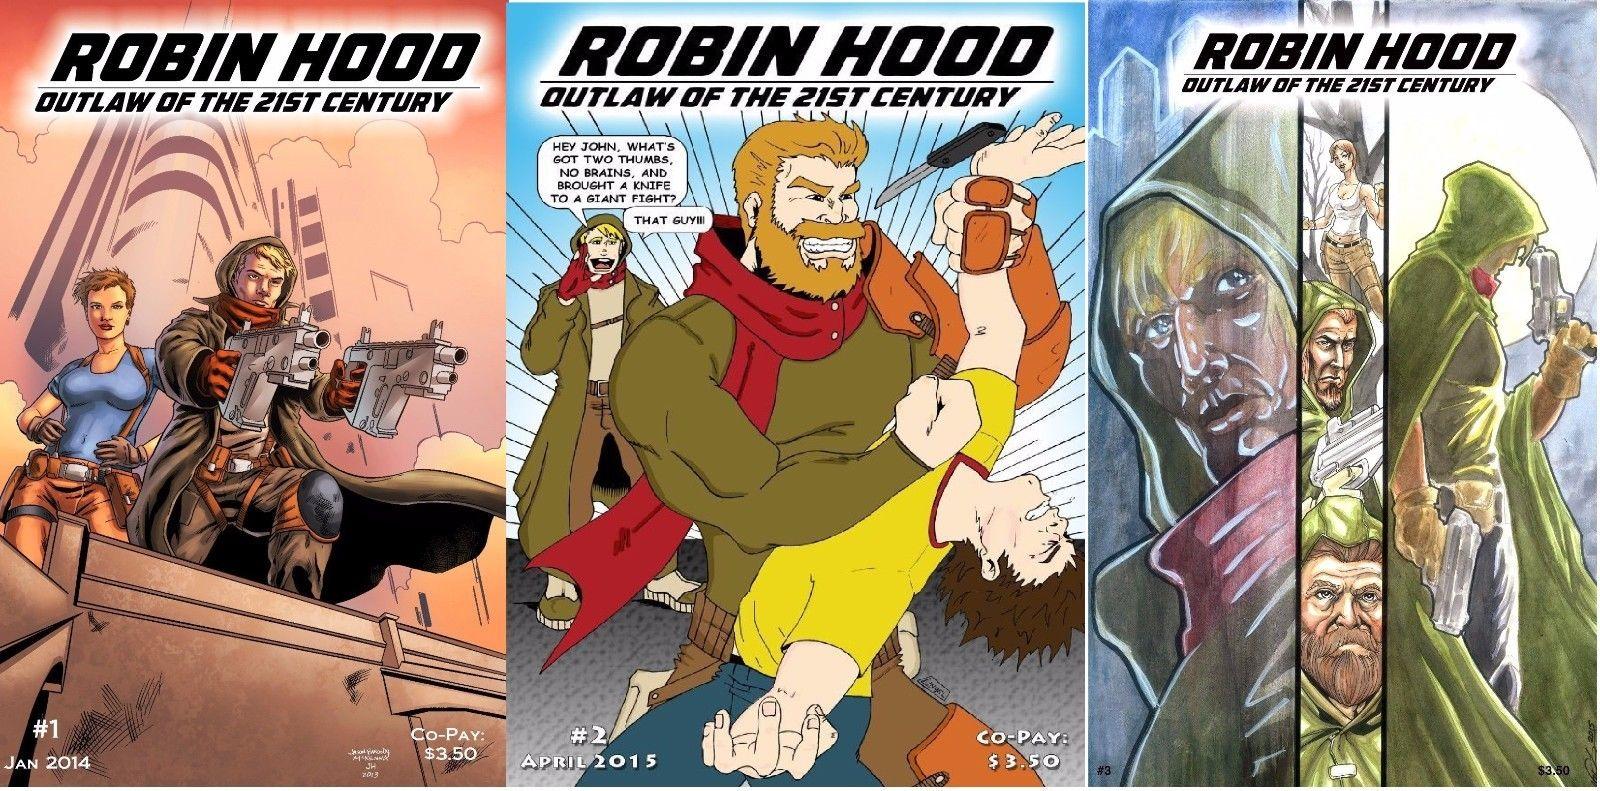 Robin Hood #1-3 for sale at Sherwood Comics!